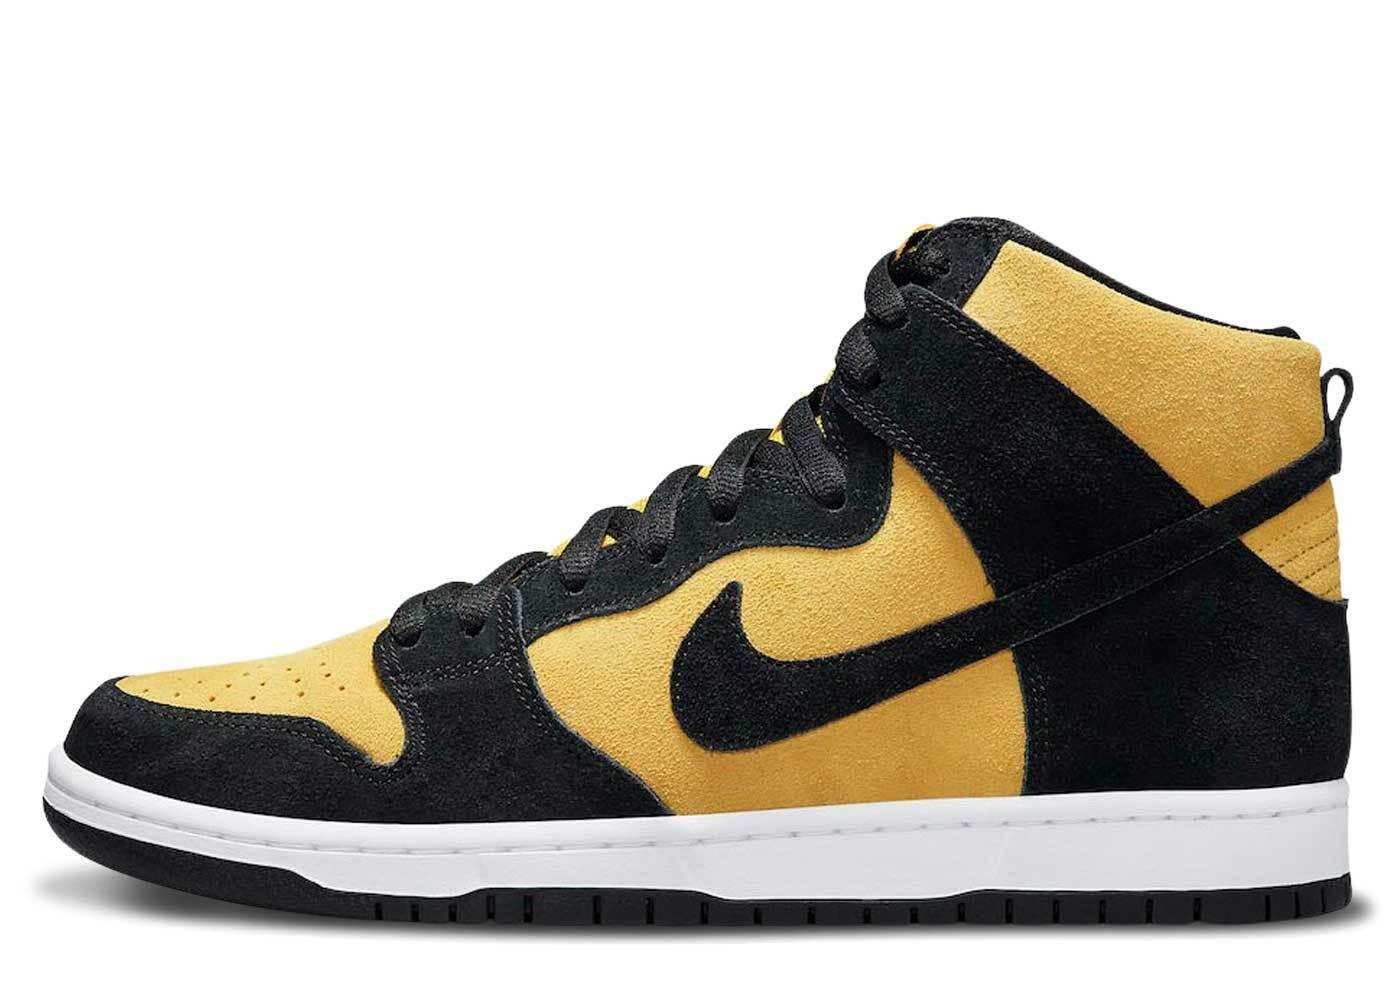 Nike SB Dunk High Maize And Blackの写真